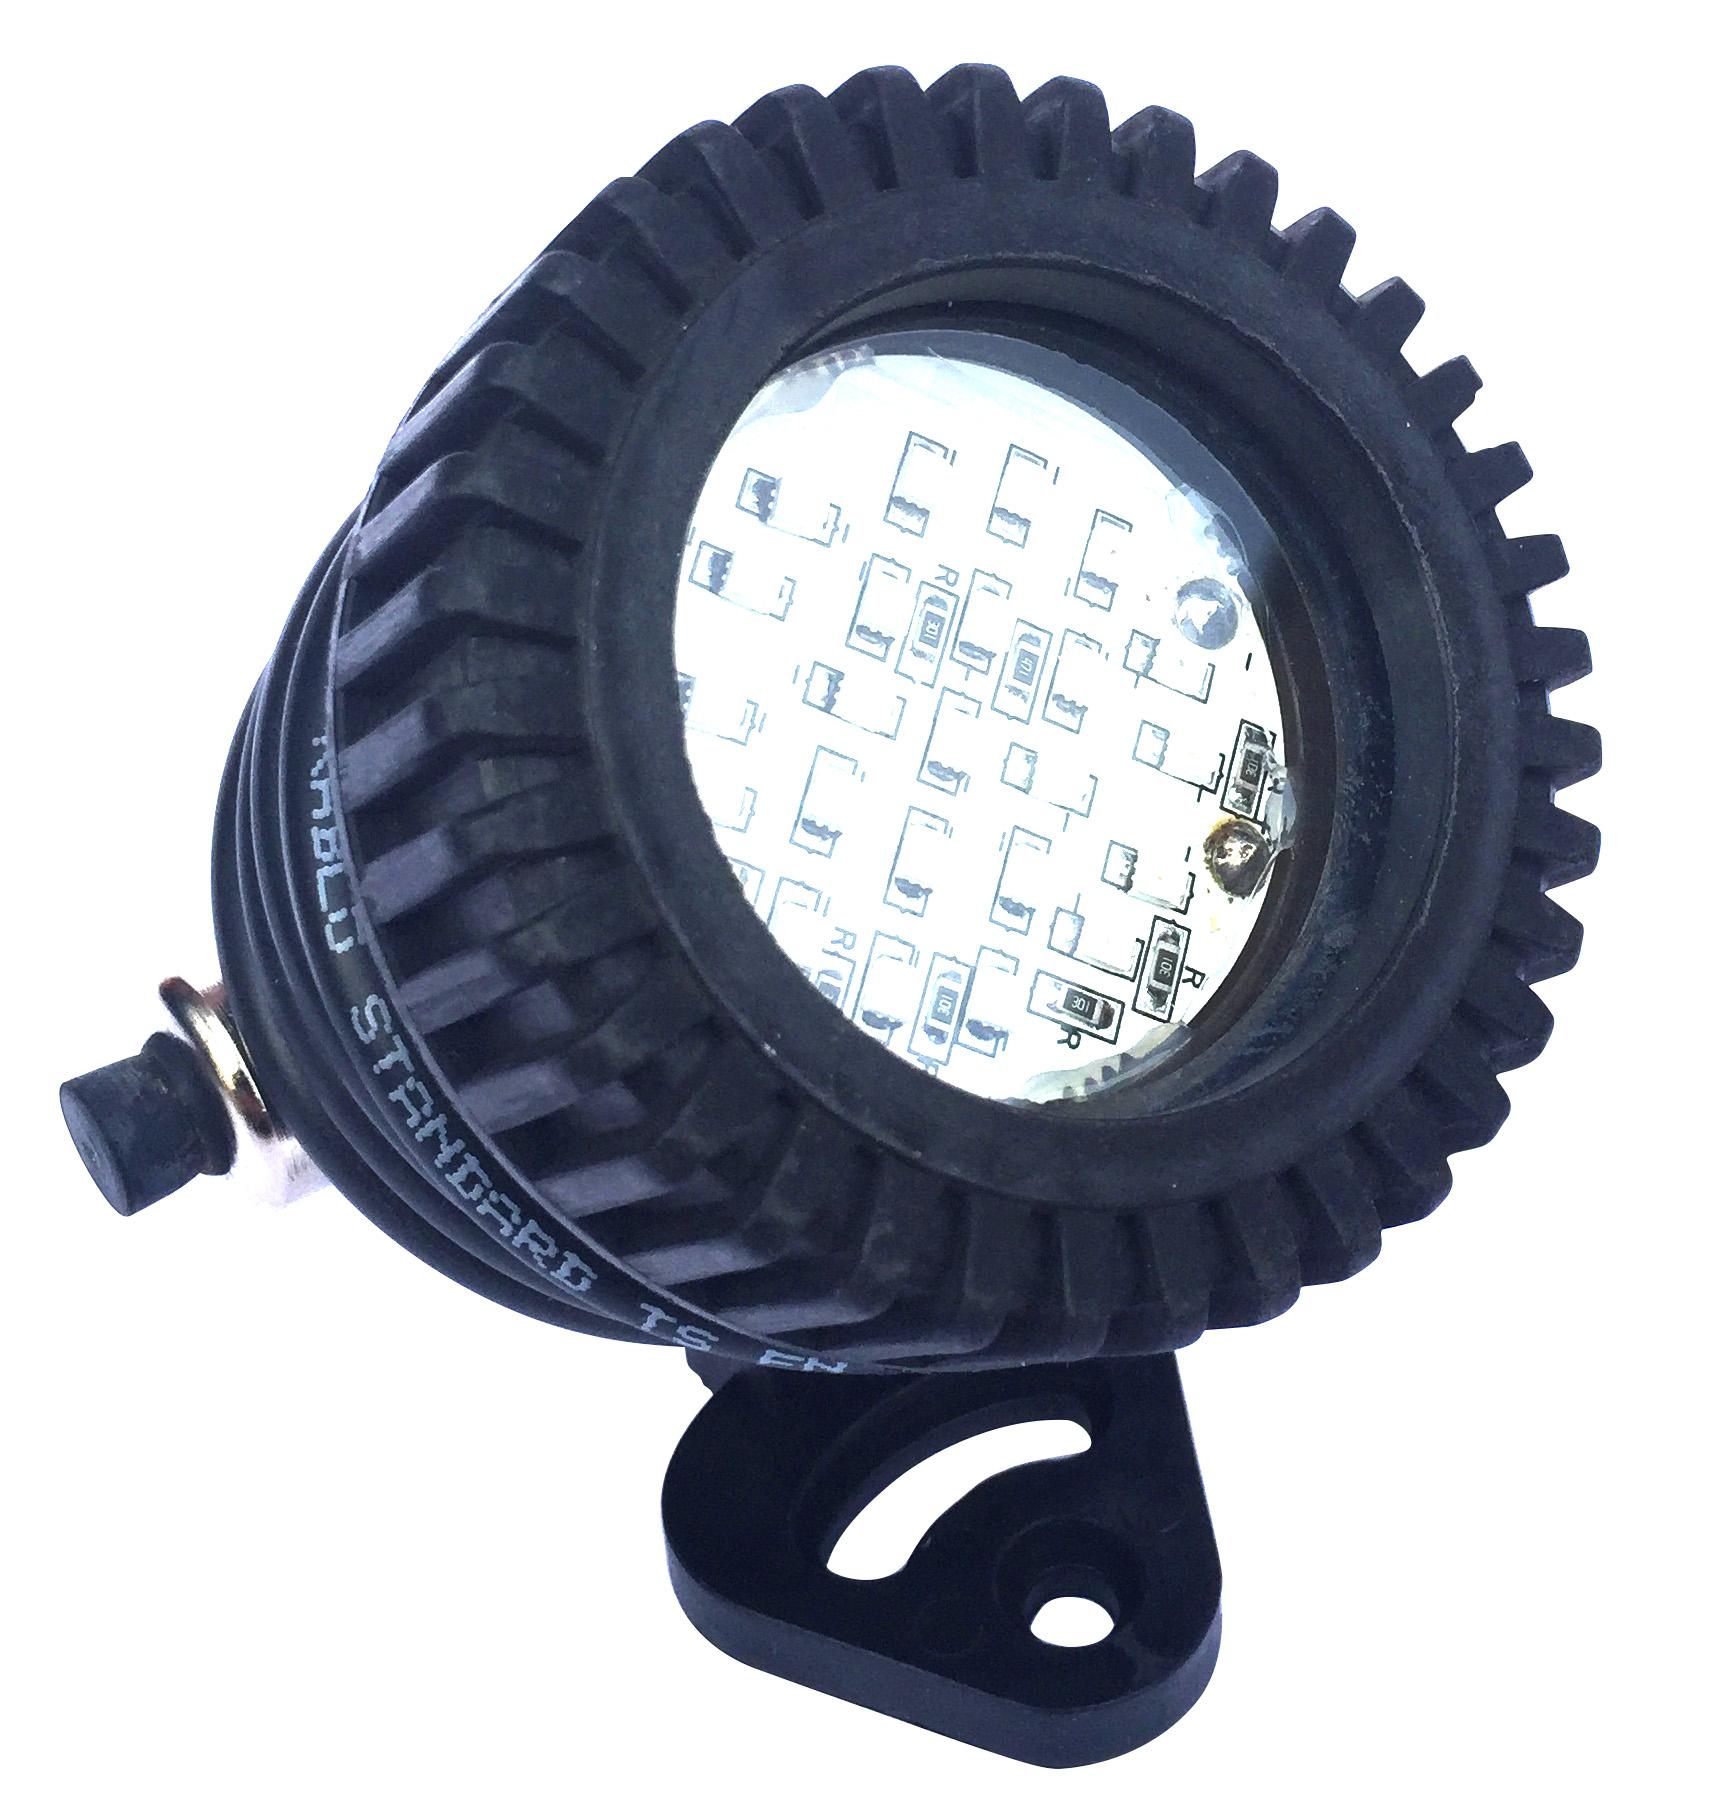 Small Decorative Spotlight: SMALL LED SPOT LIGHT FIXTURES FOR DECORATIVE POOLS